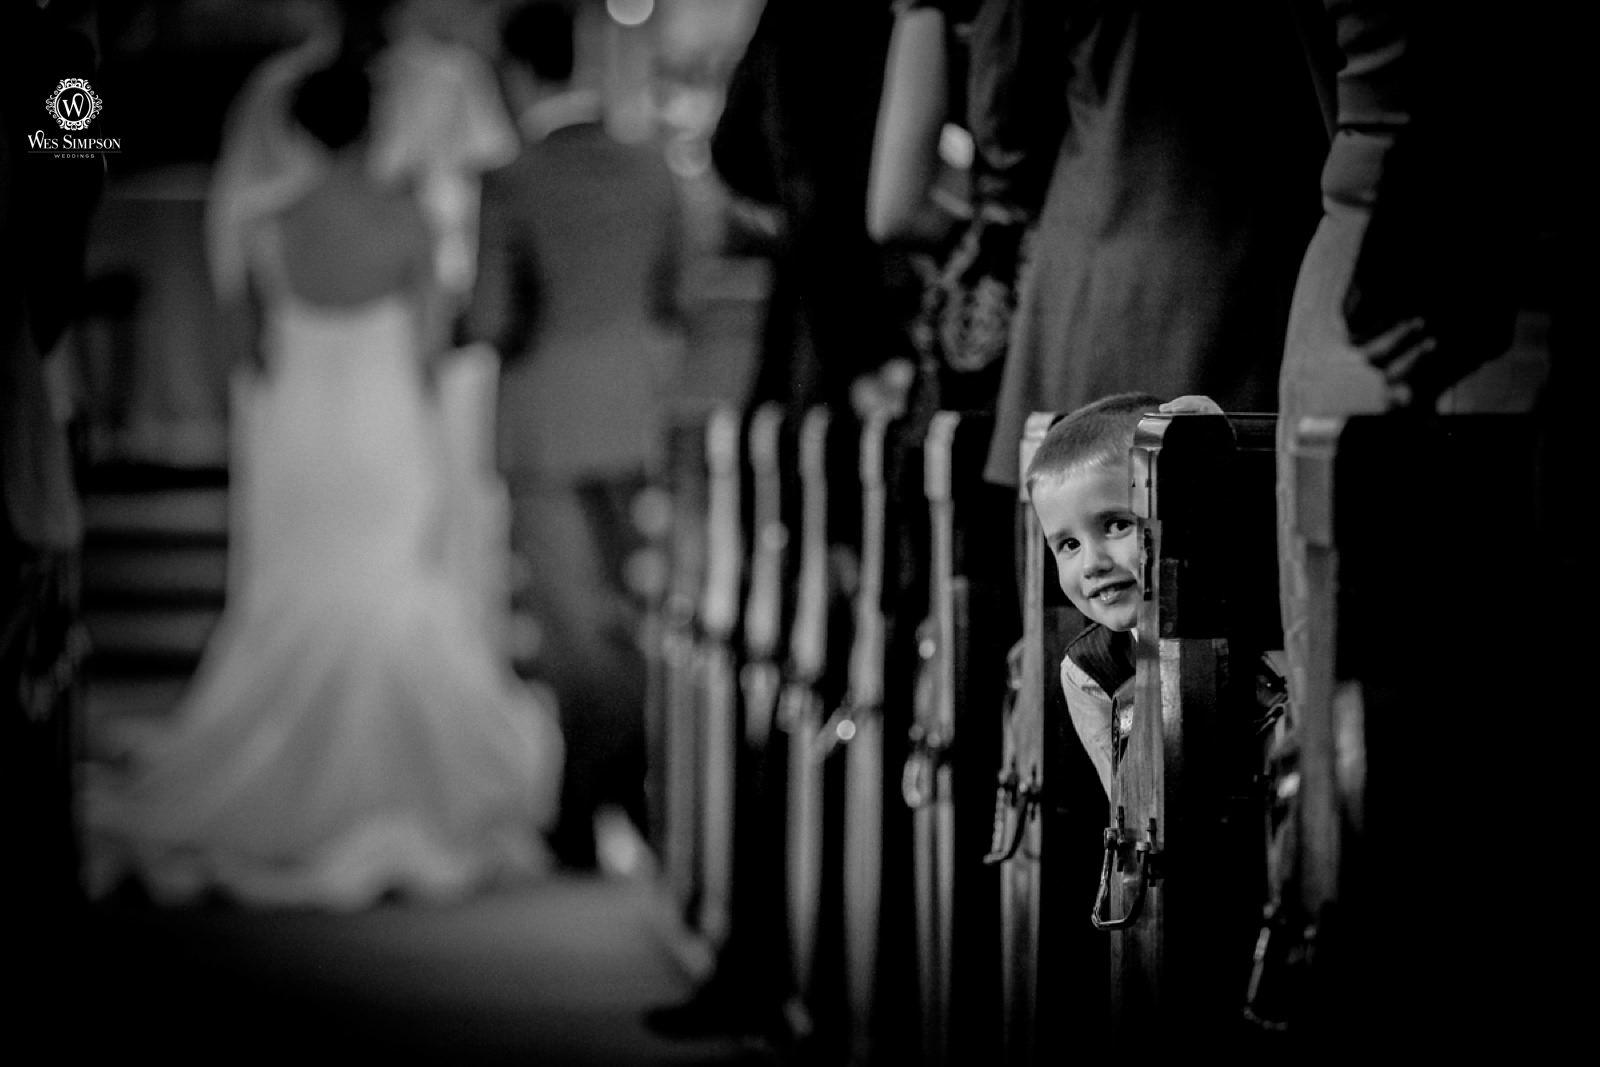 Wes Simpson wedding photography